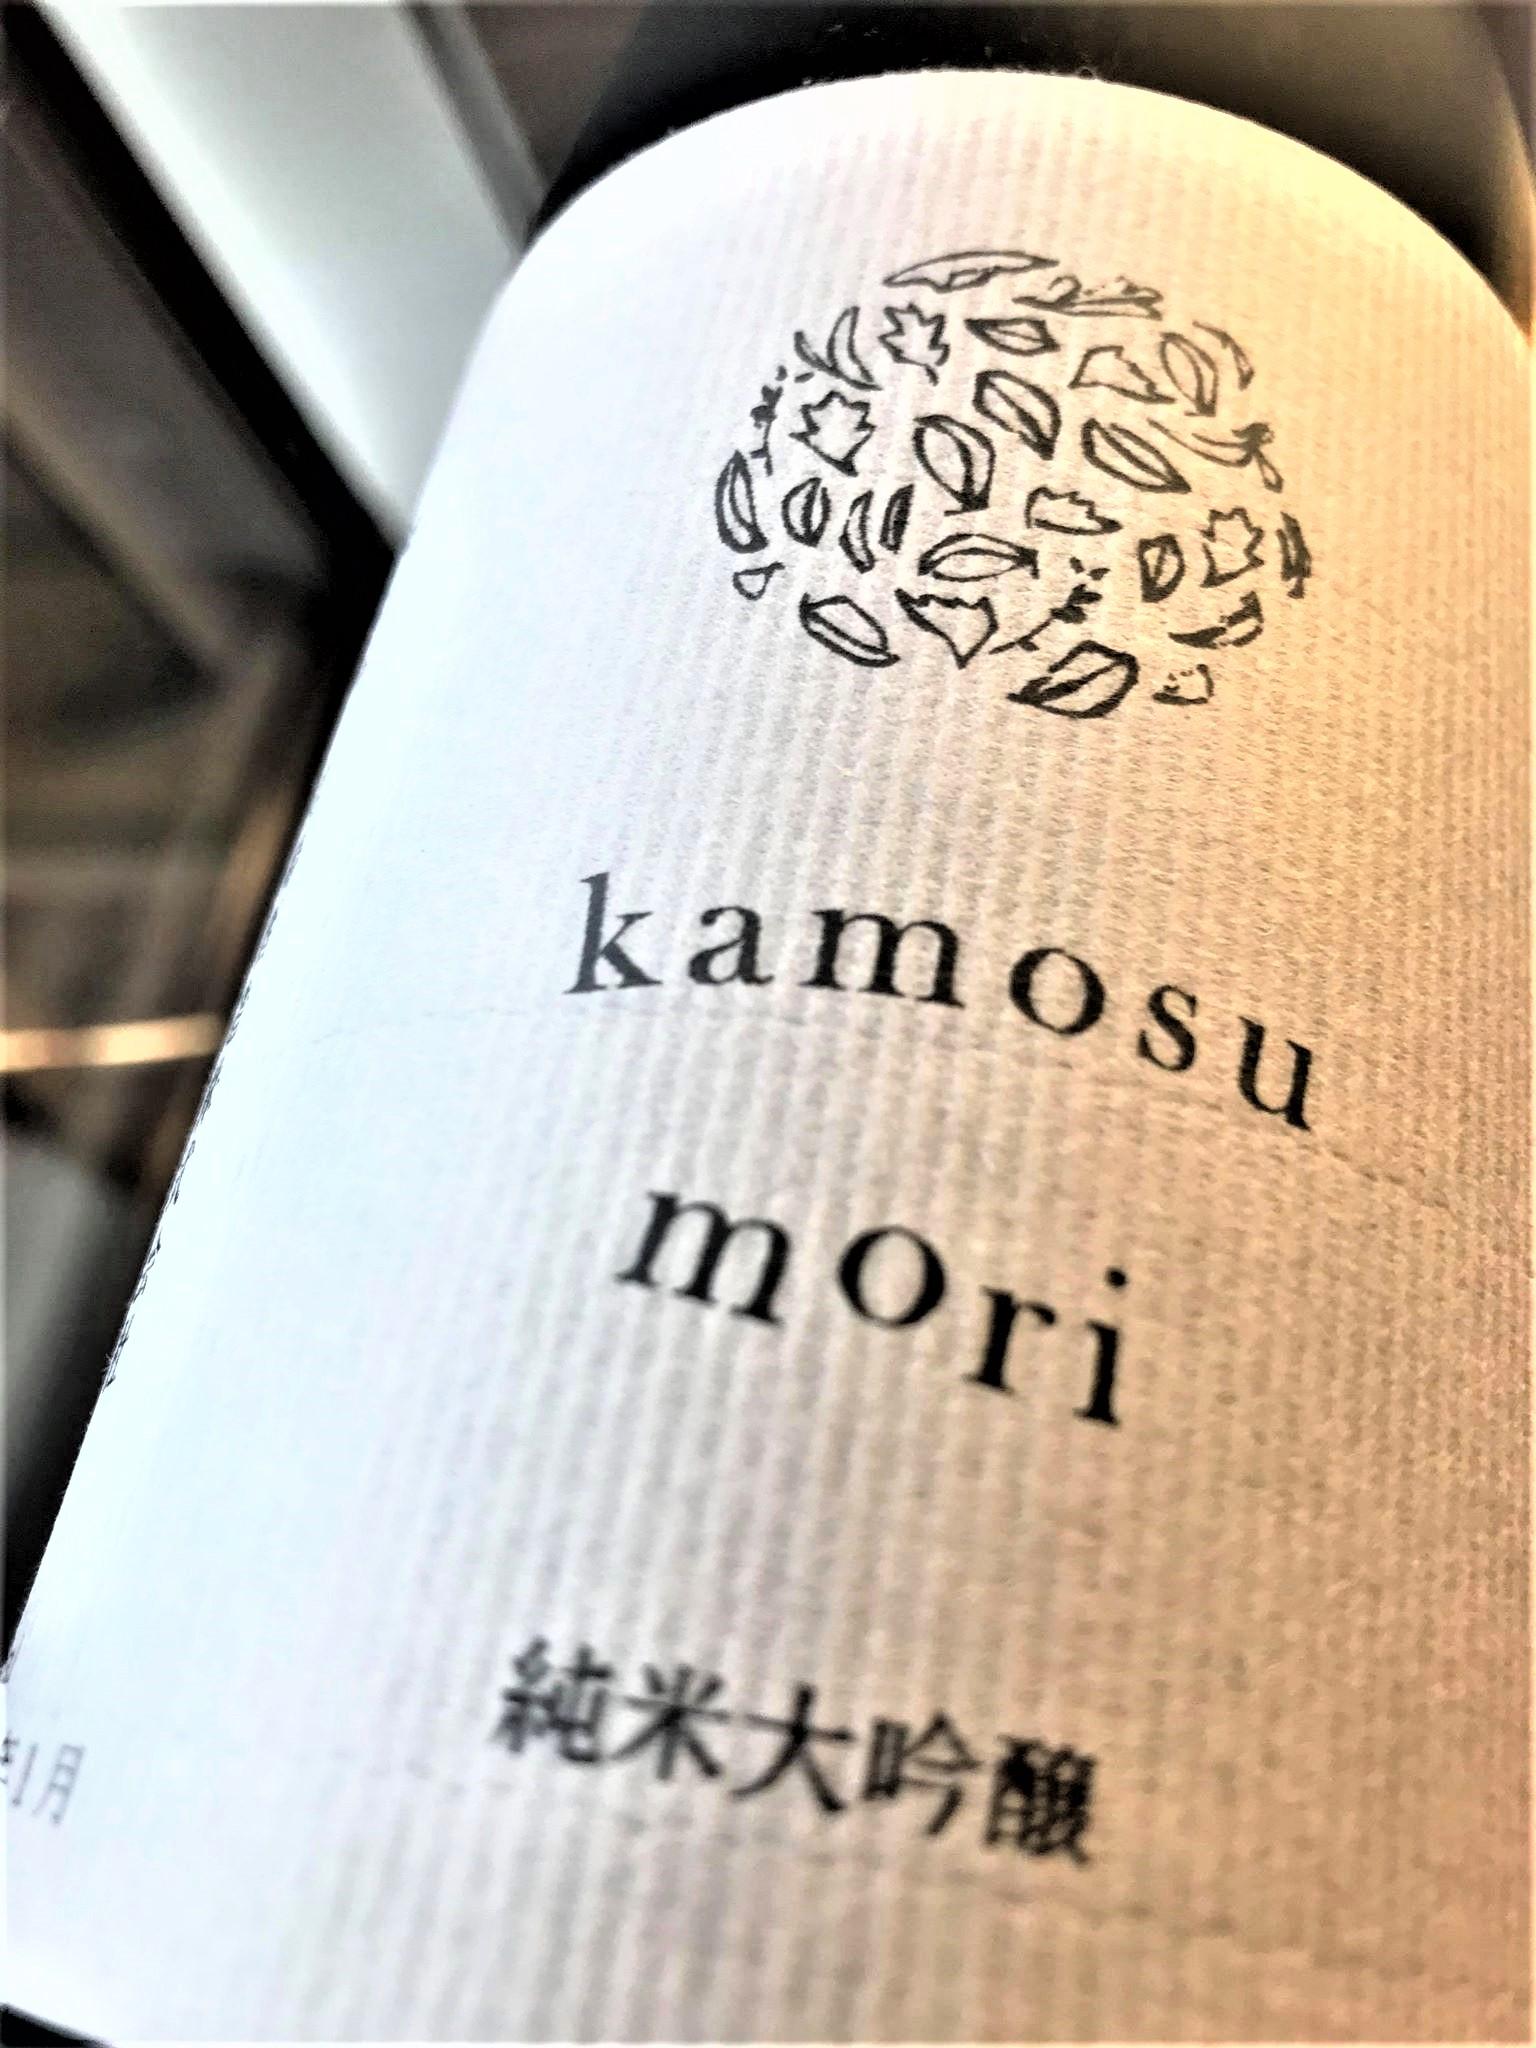 【日本酒】醸す森『kamosu mori』純米大吟醸生酒 五百万石50磨き 蔵元特別限定蔵出し 令和1BY🆕_e0173738_1864864.jpg